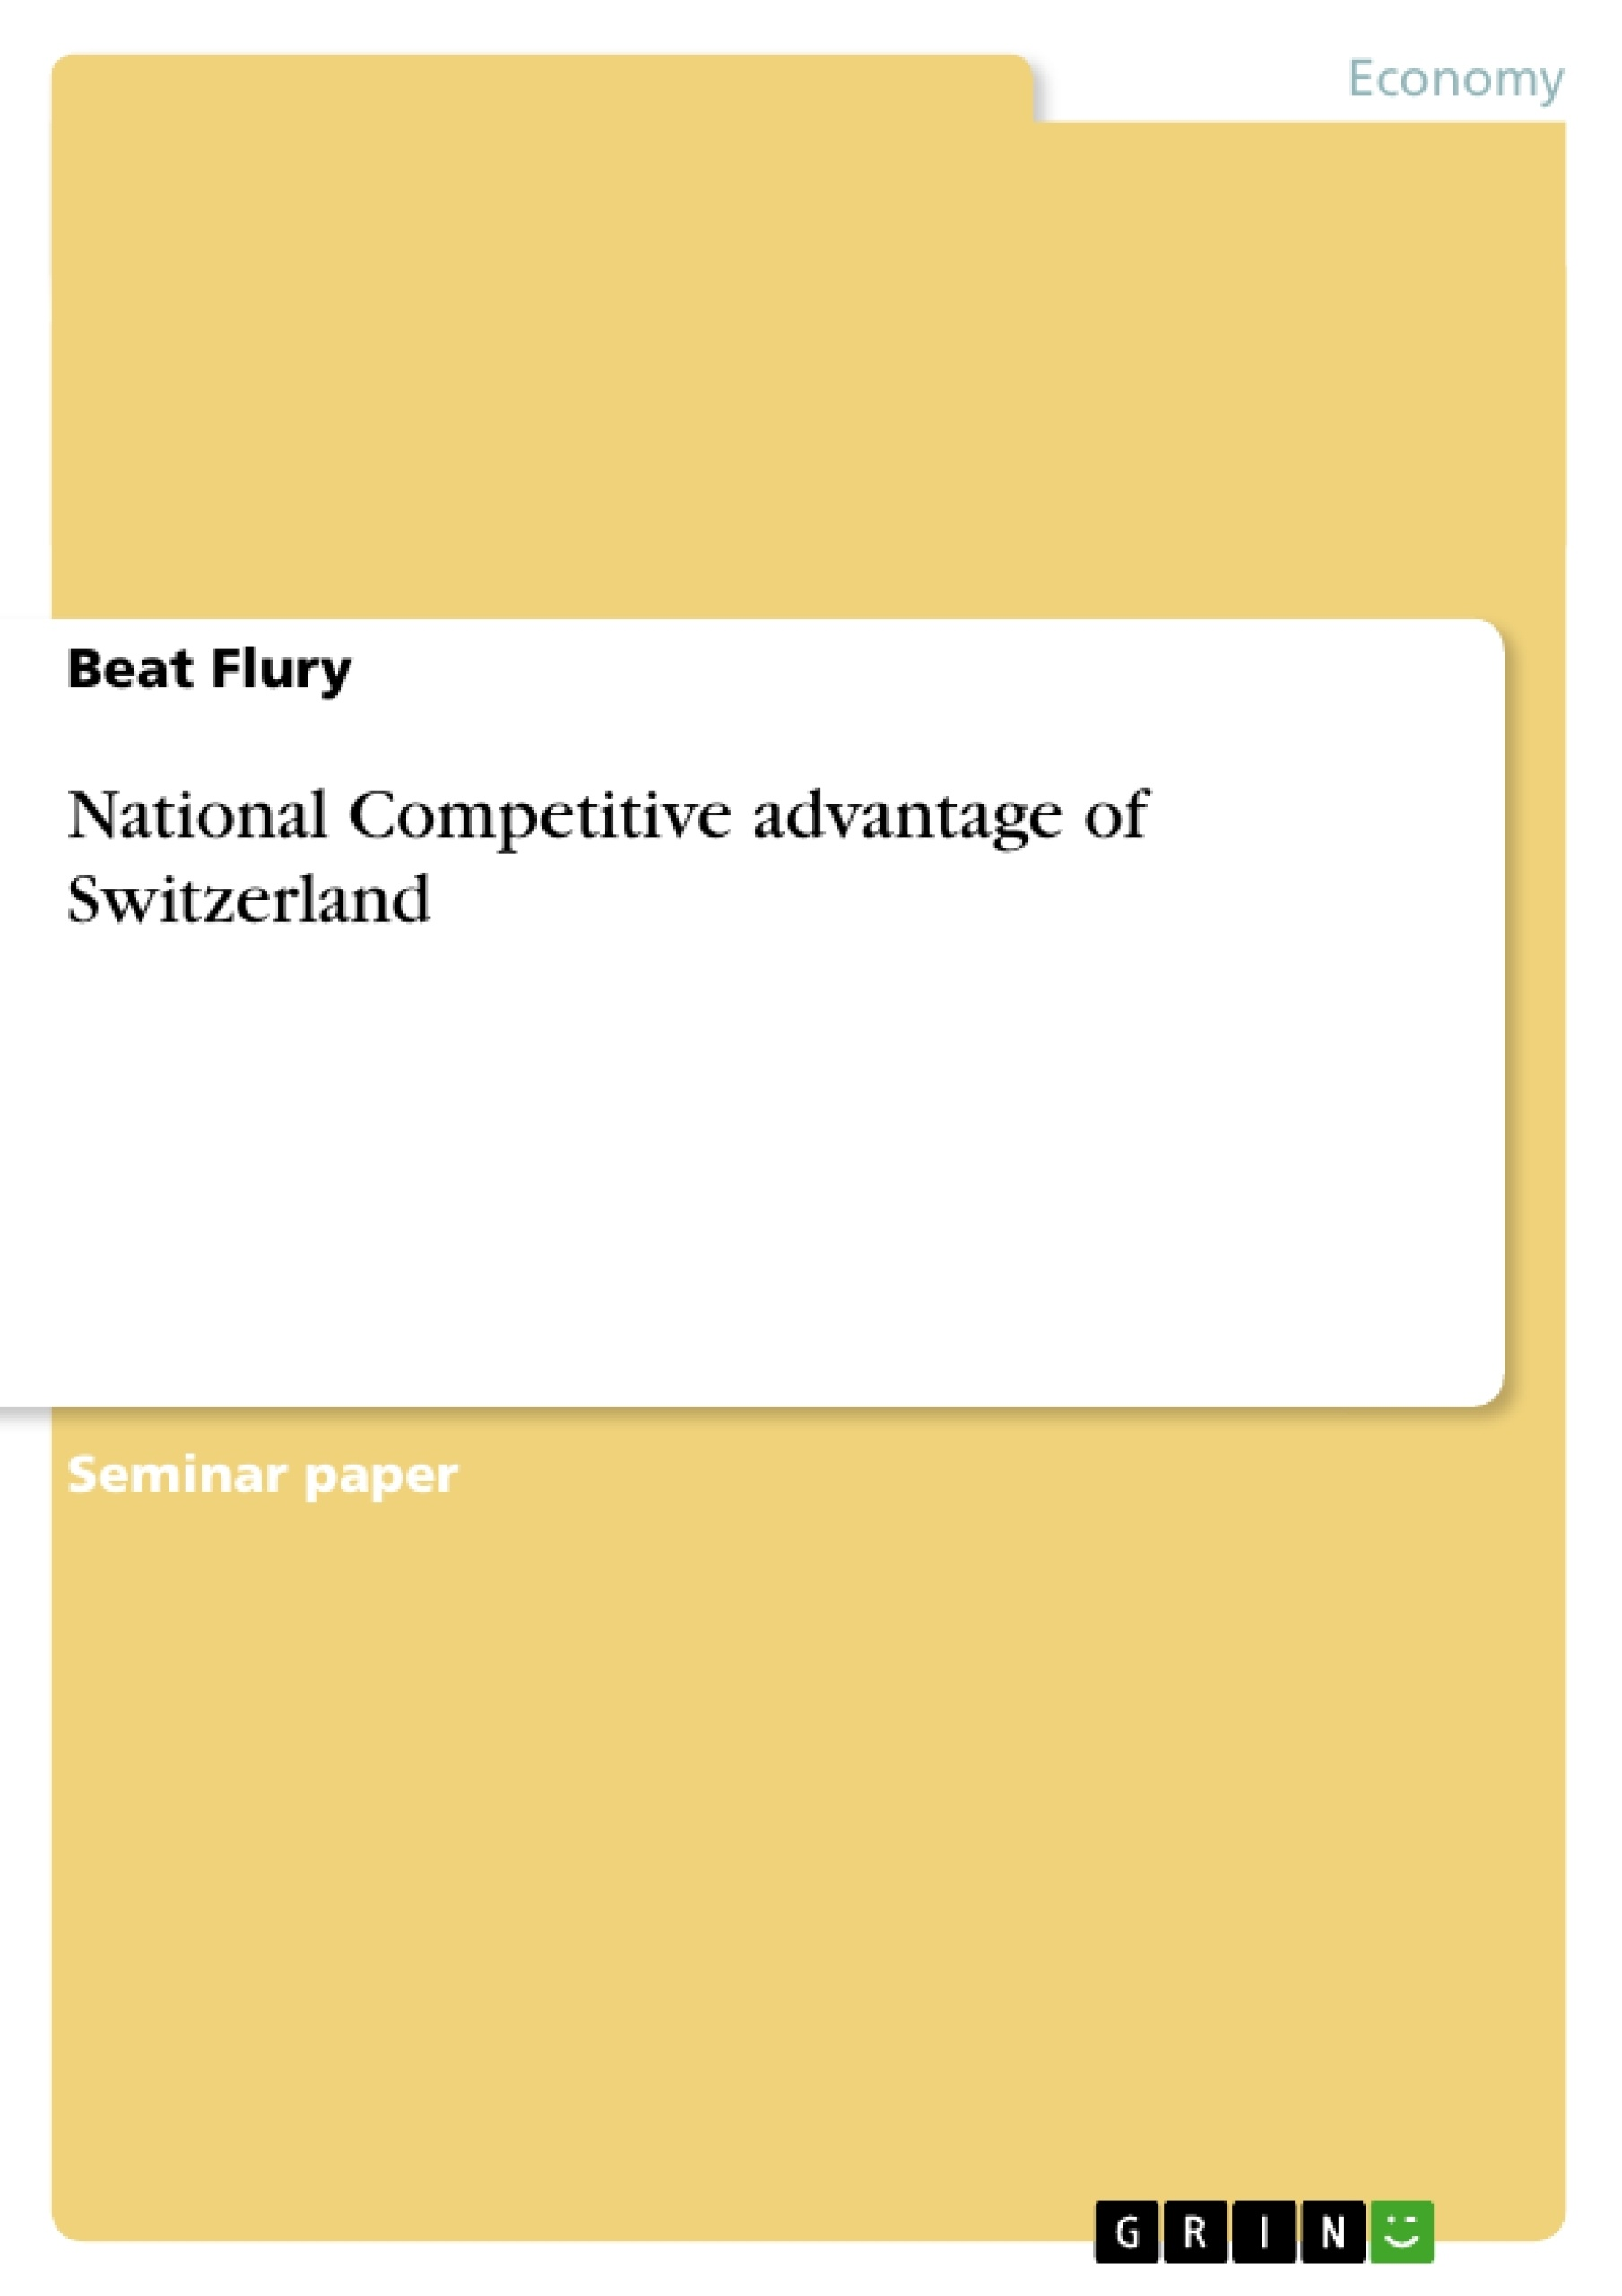 Title: National Competitive advantage of Switzerland